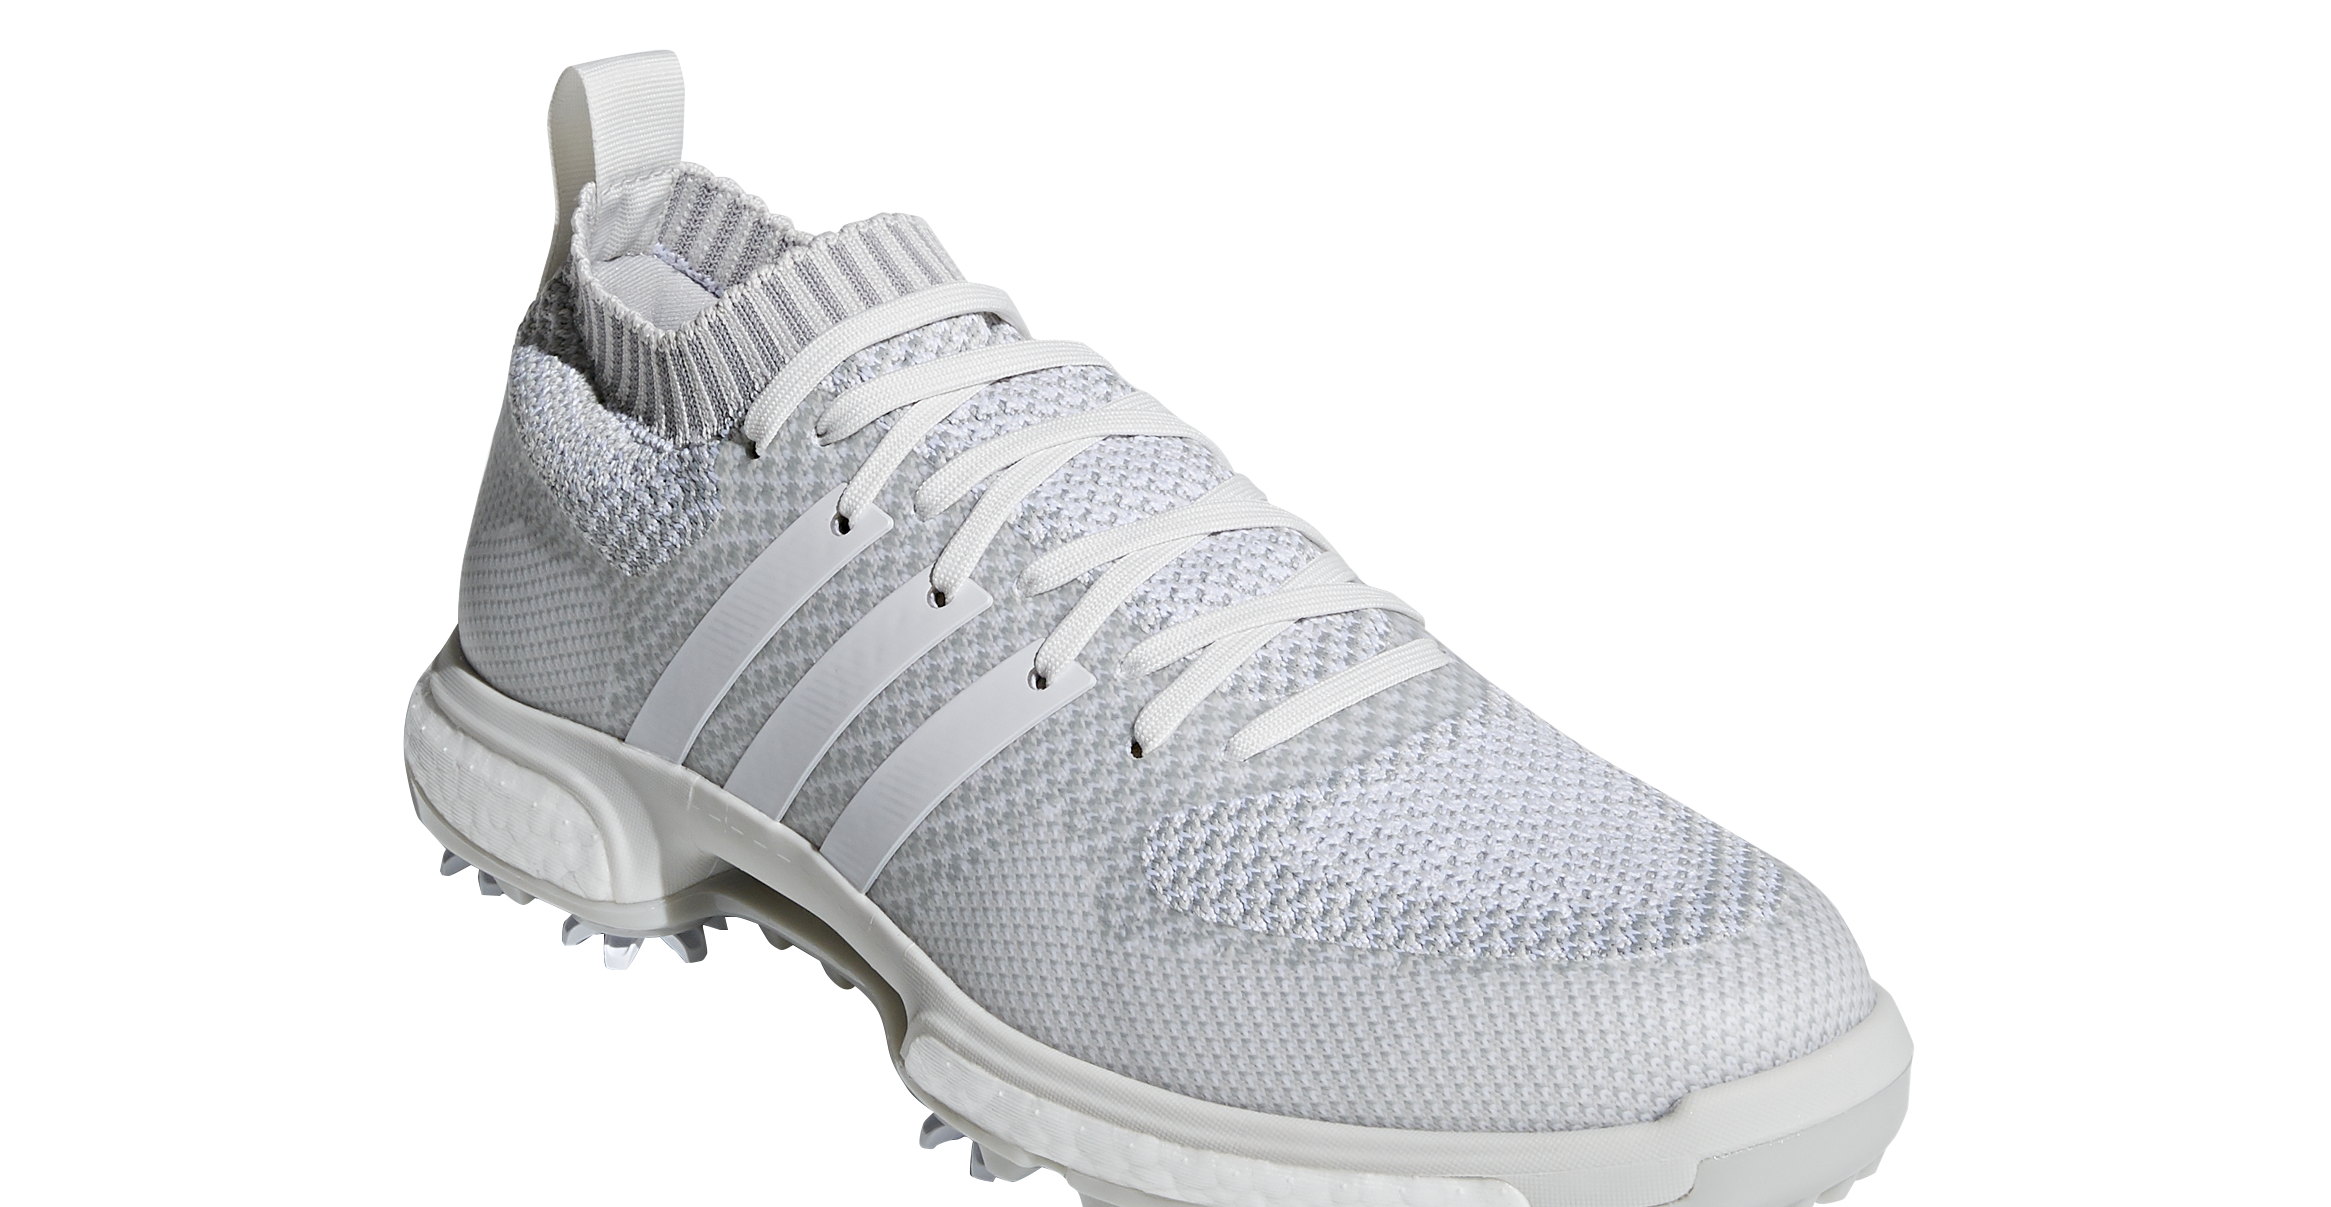 WIN! Dustin Johnson's adidas Golf Tour 360 Knit all white shoes